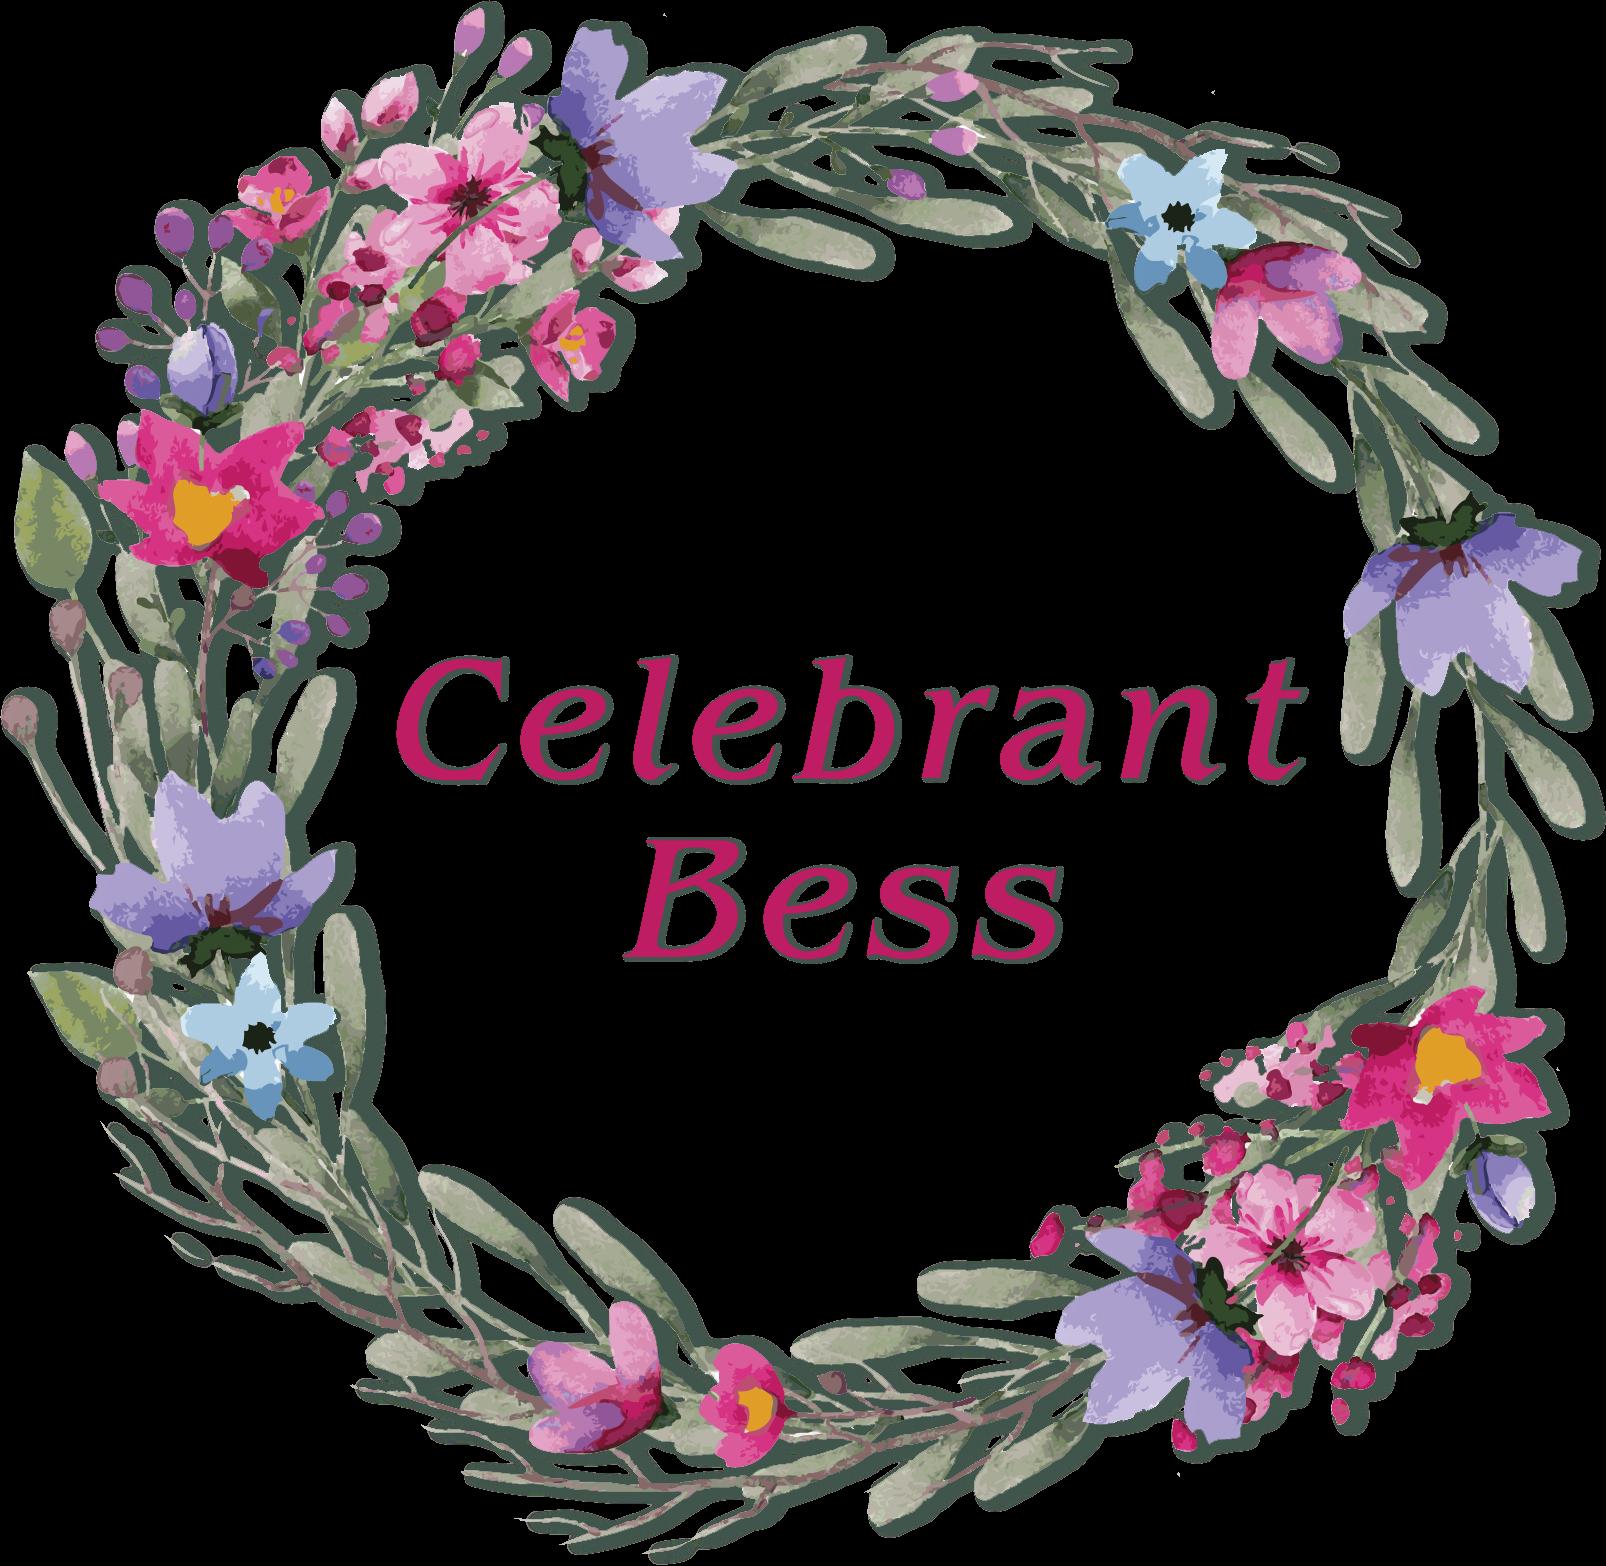 Celebrant Bess